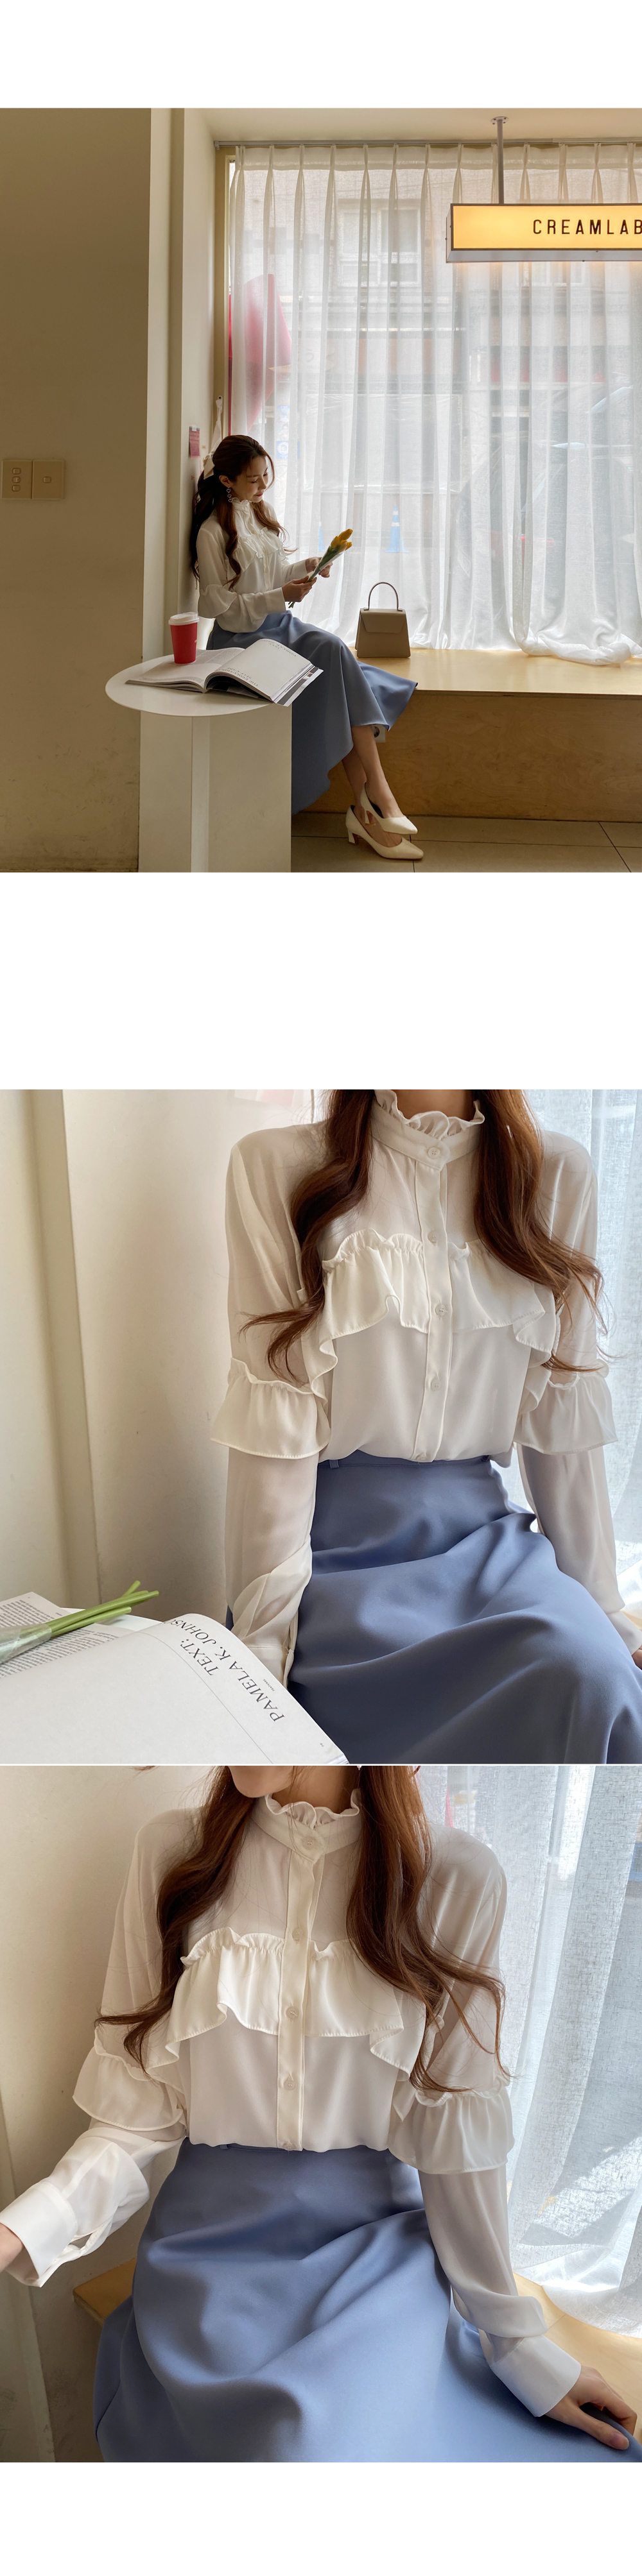 Soft sunny ruffled blouse